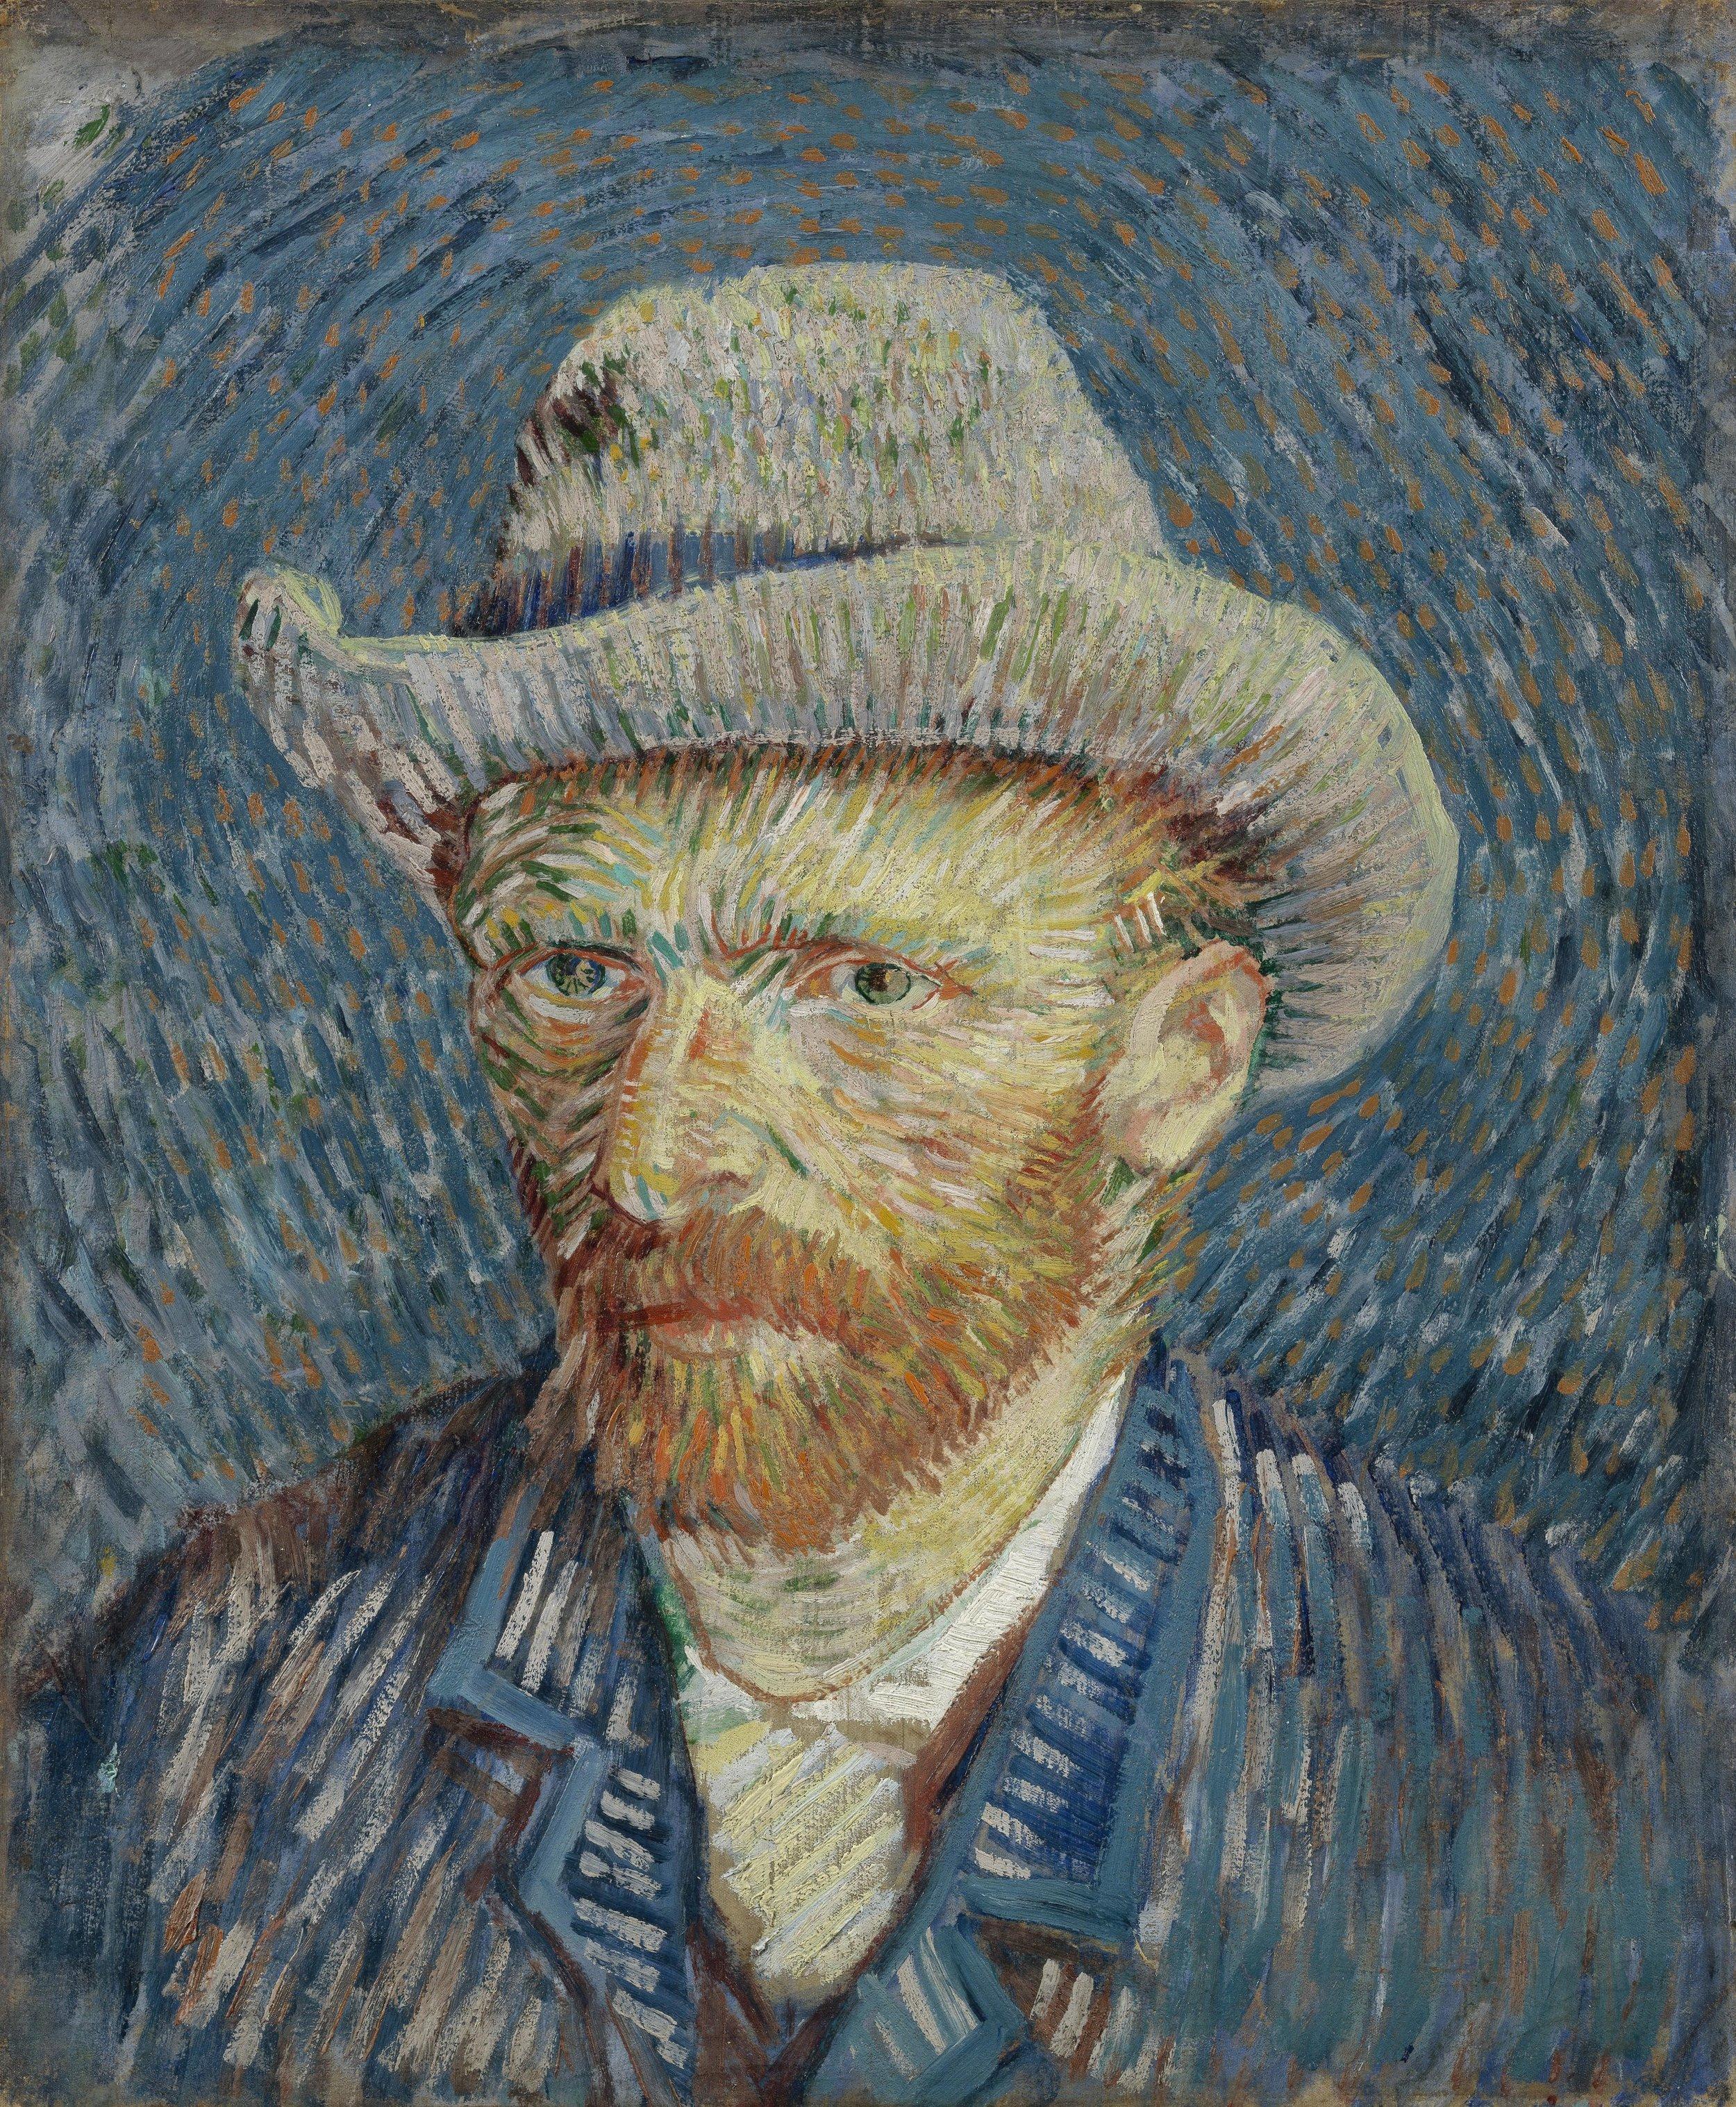 Self-Portrait with Grey Felt Hat - Vincent van Gogh, 1887